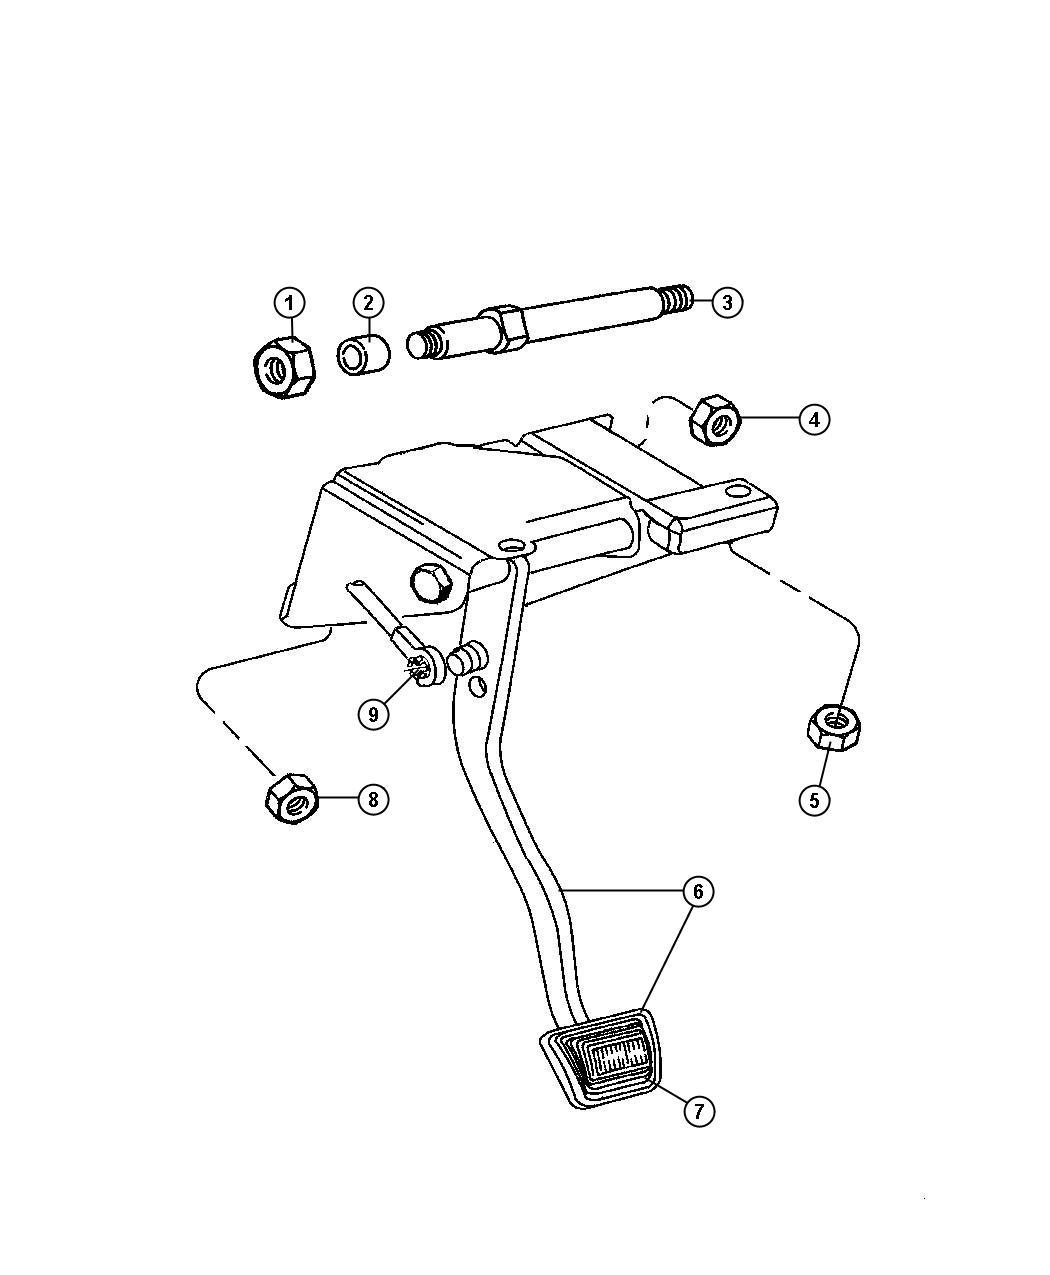 1999 Jeep Wrangler Bushing. Hydraulic clutch actuator